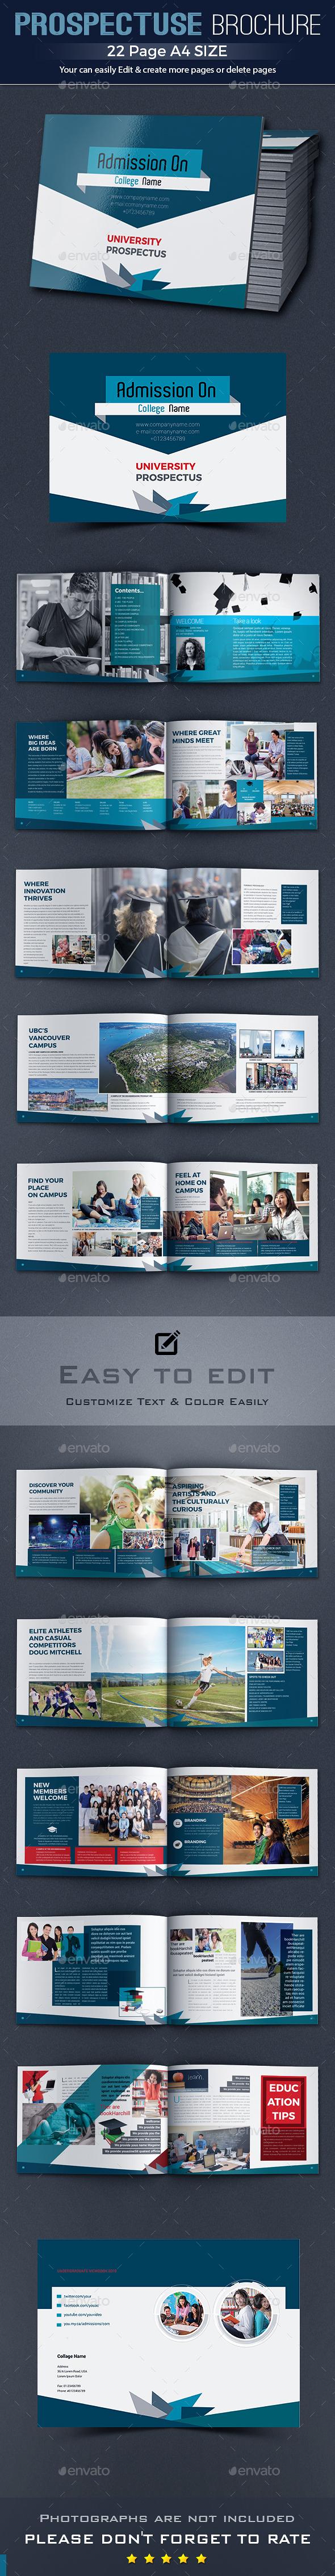 GraphicRiver Education Prospectus Brochure 20387100